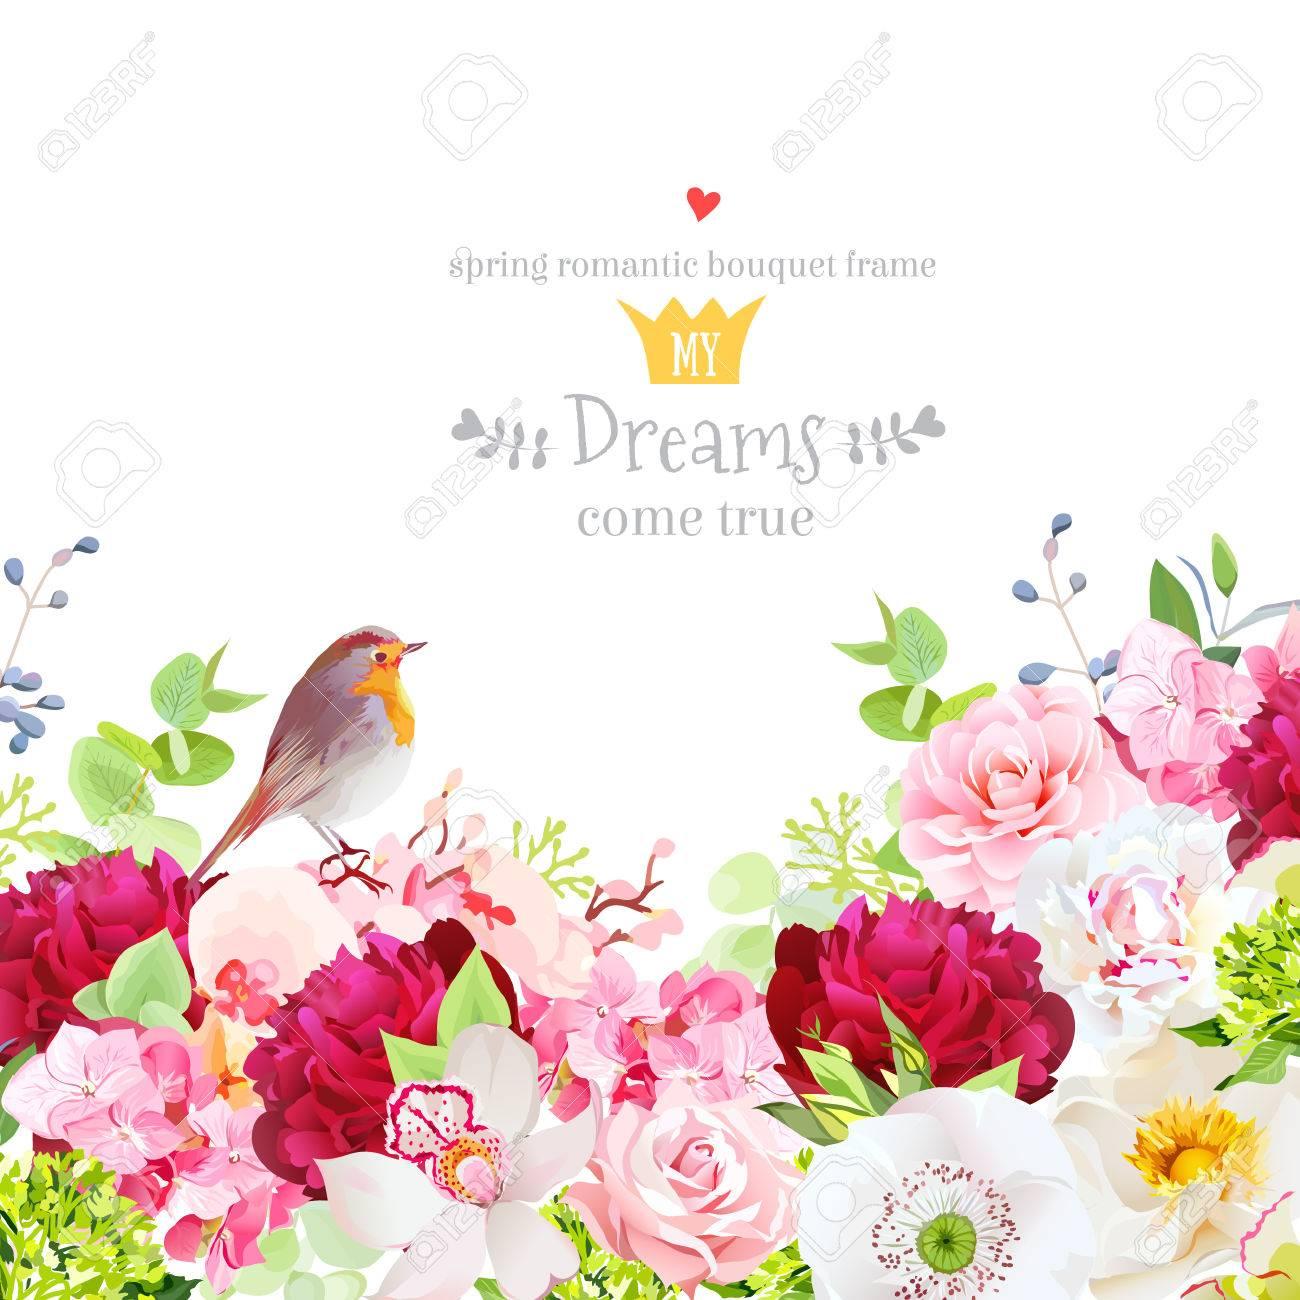 Botanical style frame with flower mix - 83853001